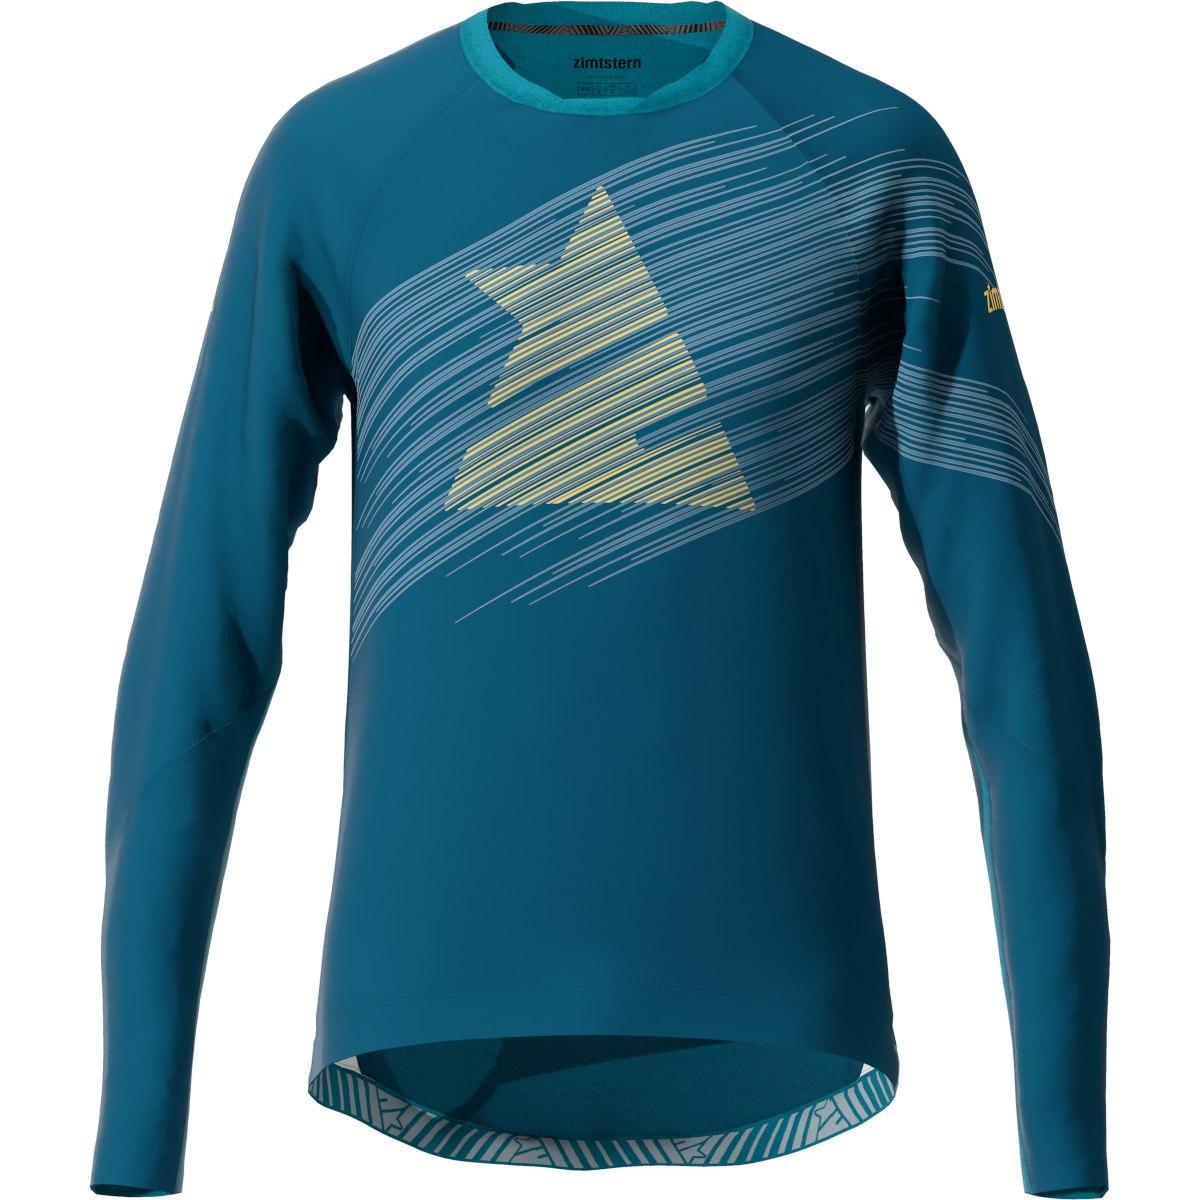 Zimtstern ProTechZonez Windbreaker MTB Long Sleeve Shirt - french navy/blue steele